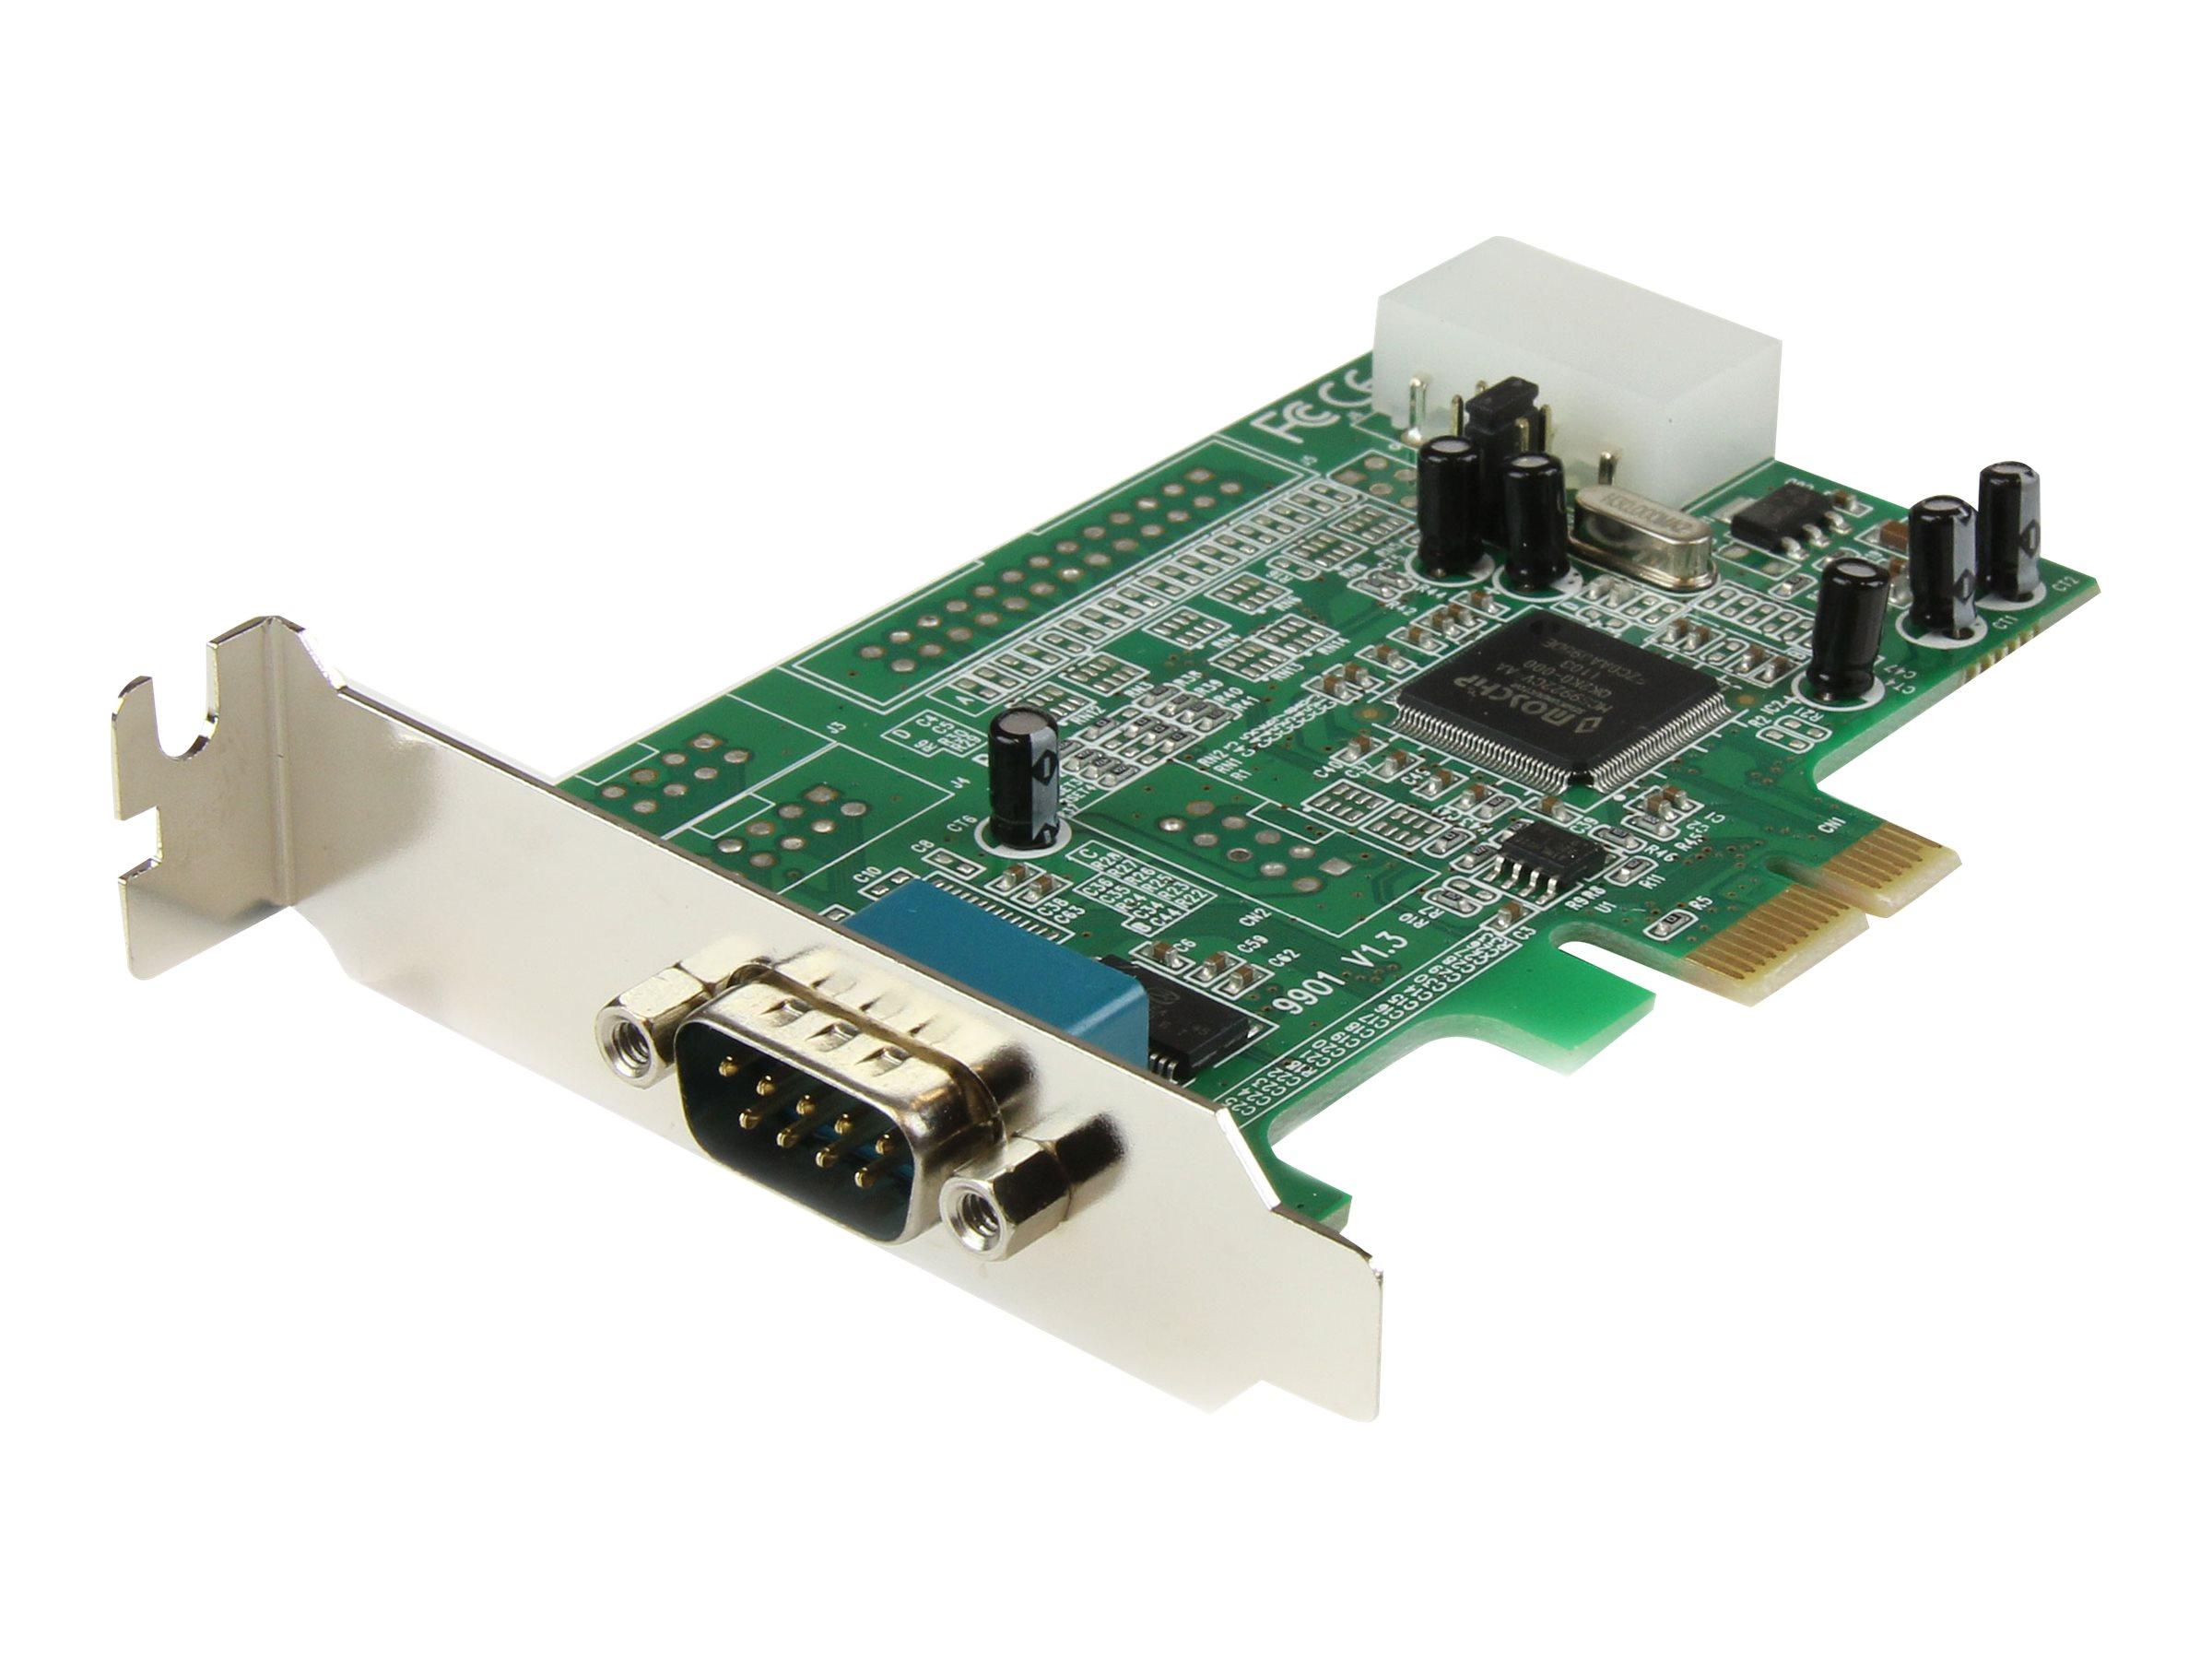 StarTech.com Seriell RS232 PCI Express Schnittstellenkarte mit 16550 UART - Low Profile - Serieller Adapter - PCIe Low-Profile -